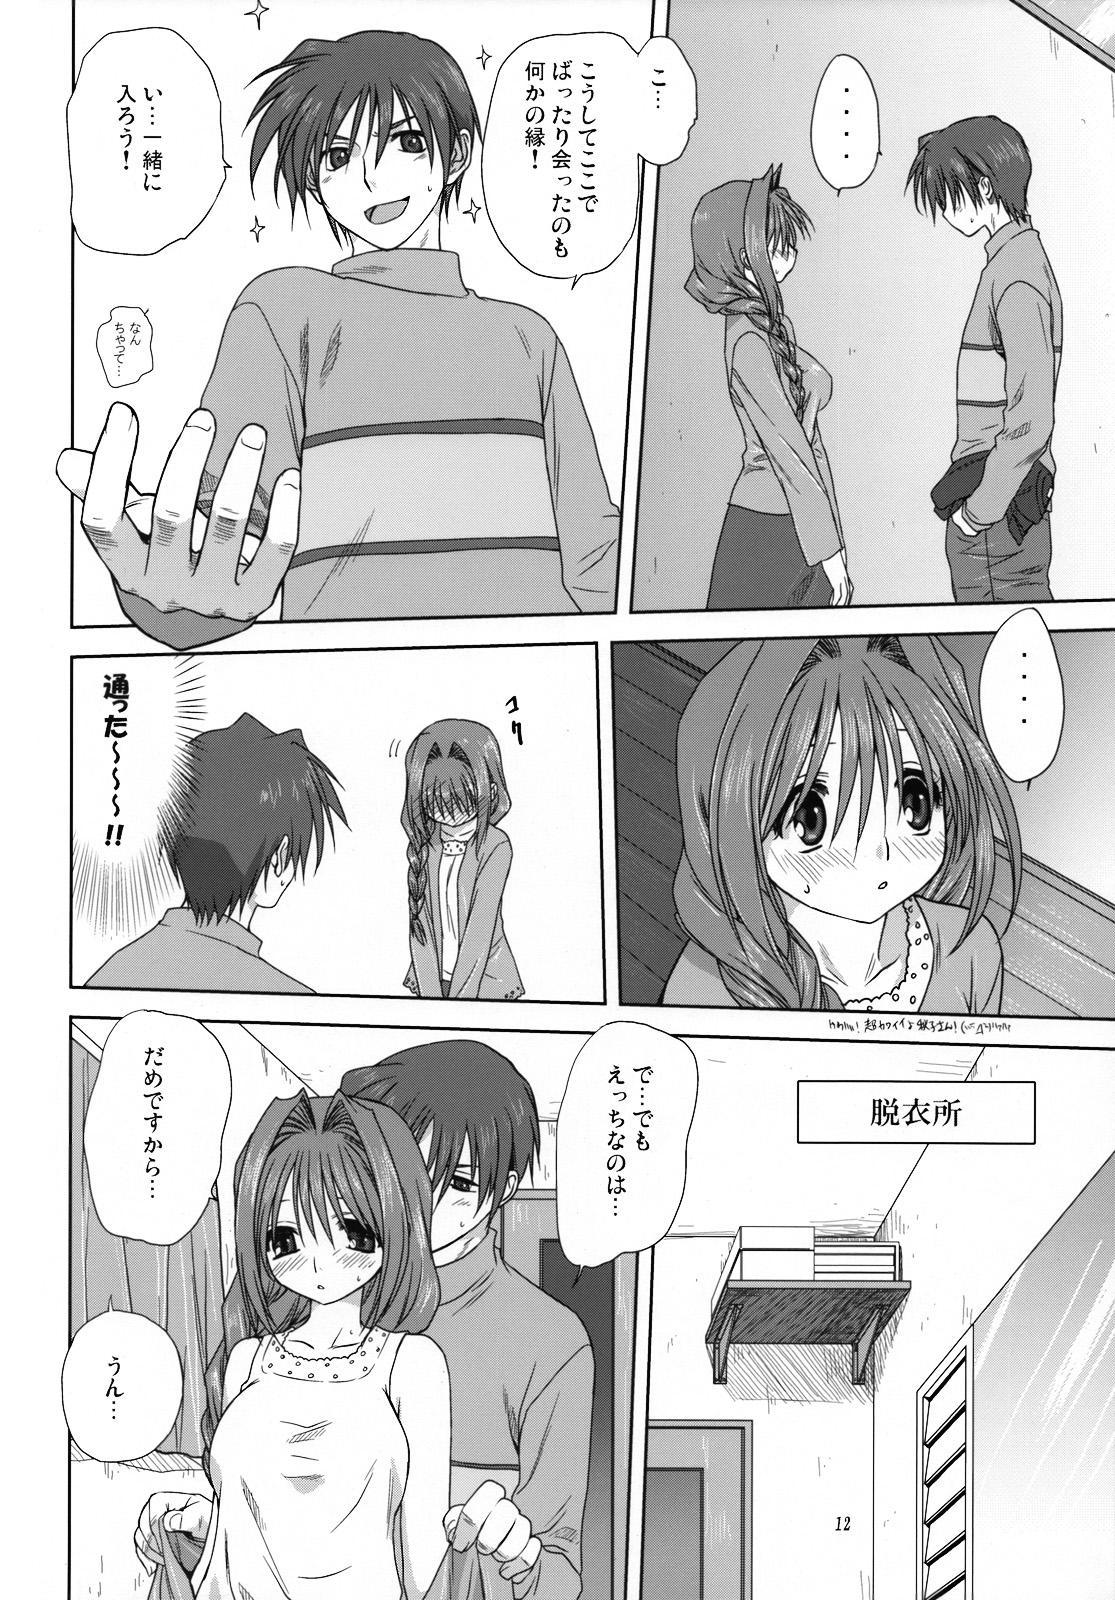 Akiko-san to Issho 3 10